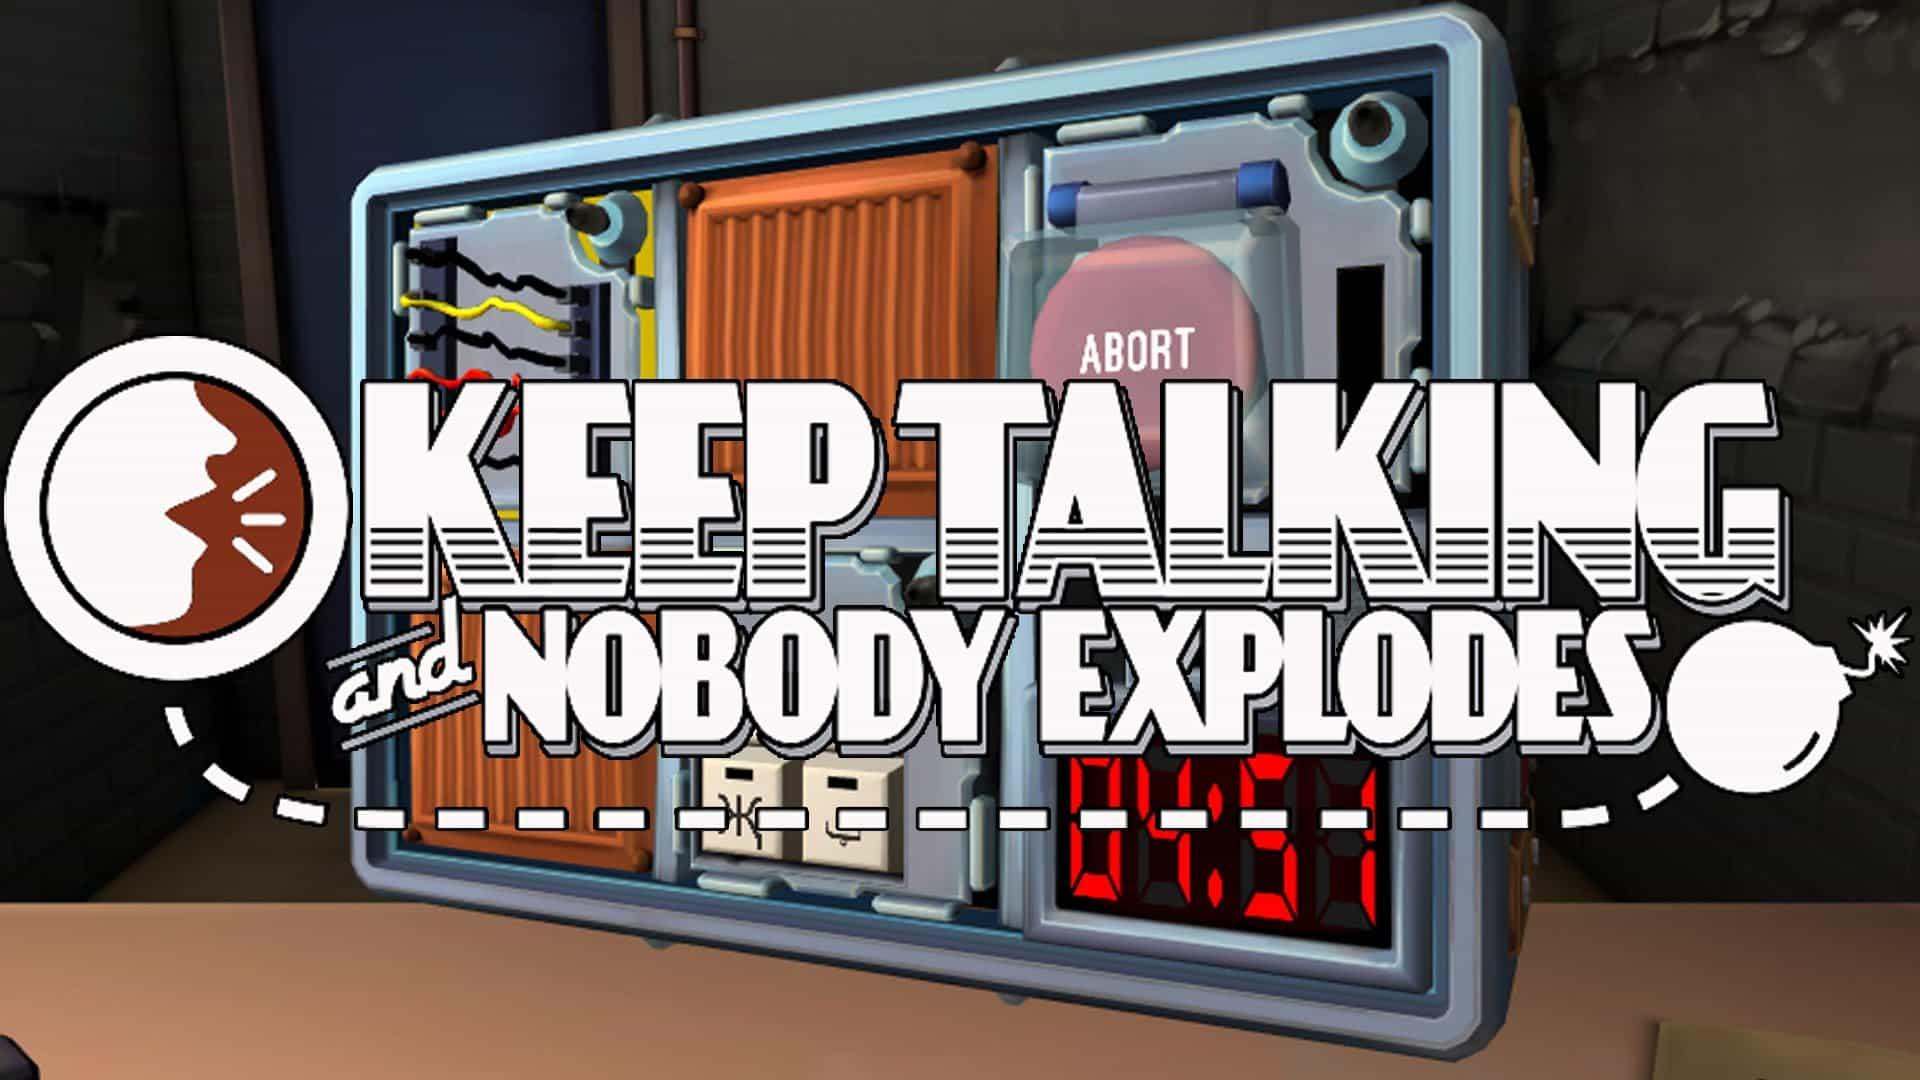 jogar com amigos keep talking and nobody explodes